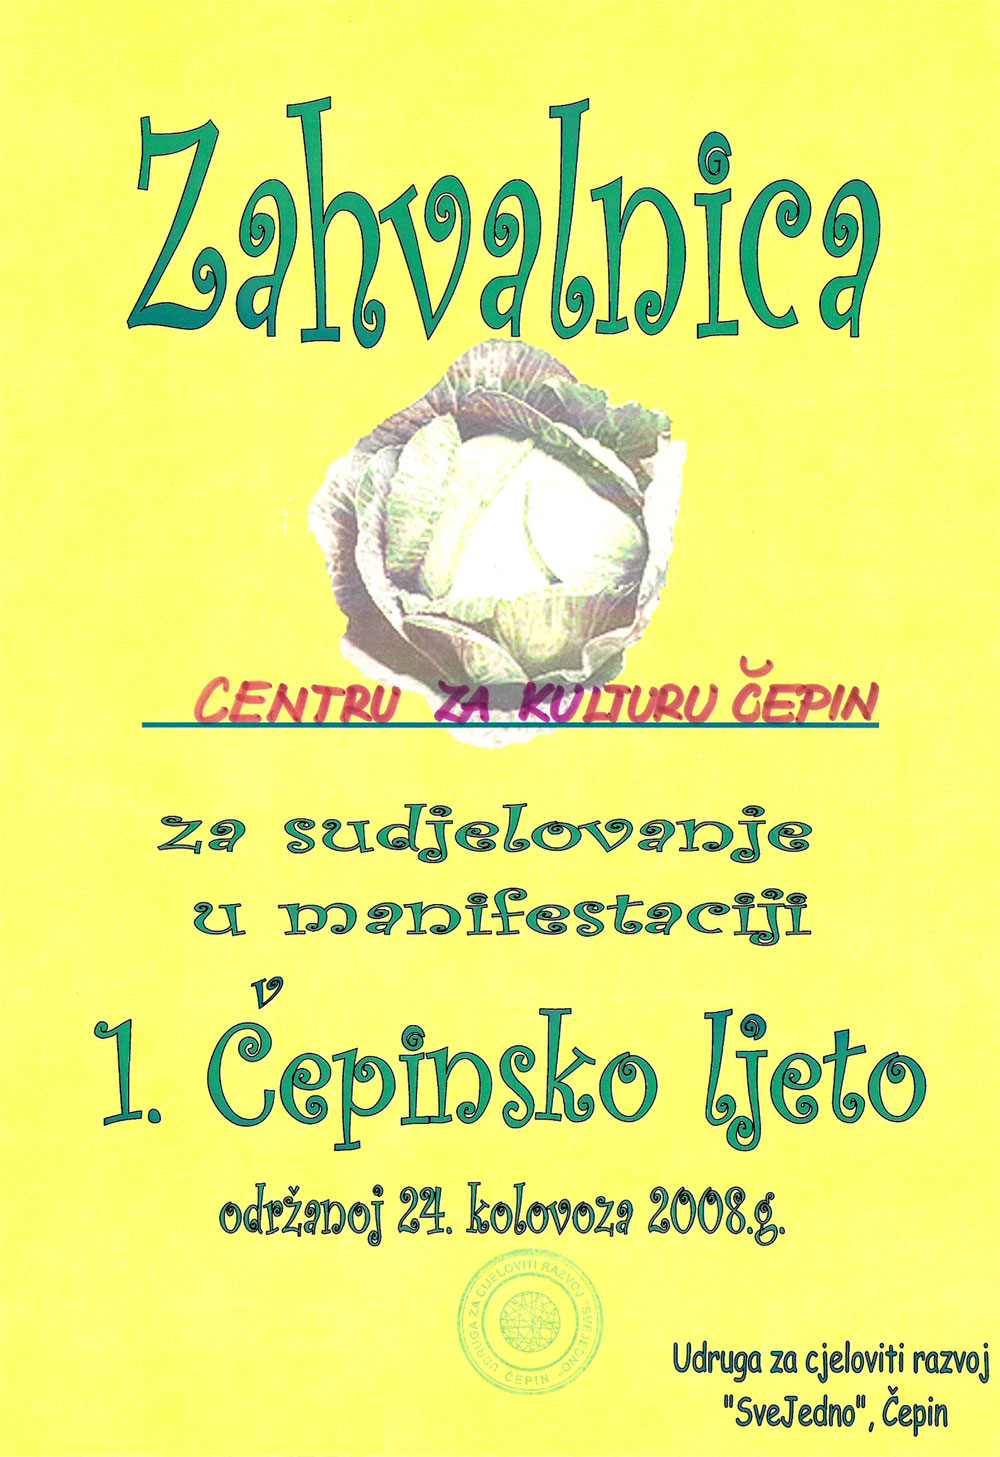 Zahvalnica centru za kulturu Čepin - Knjižnica